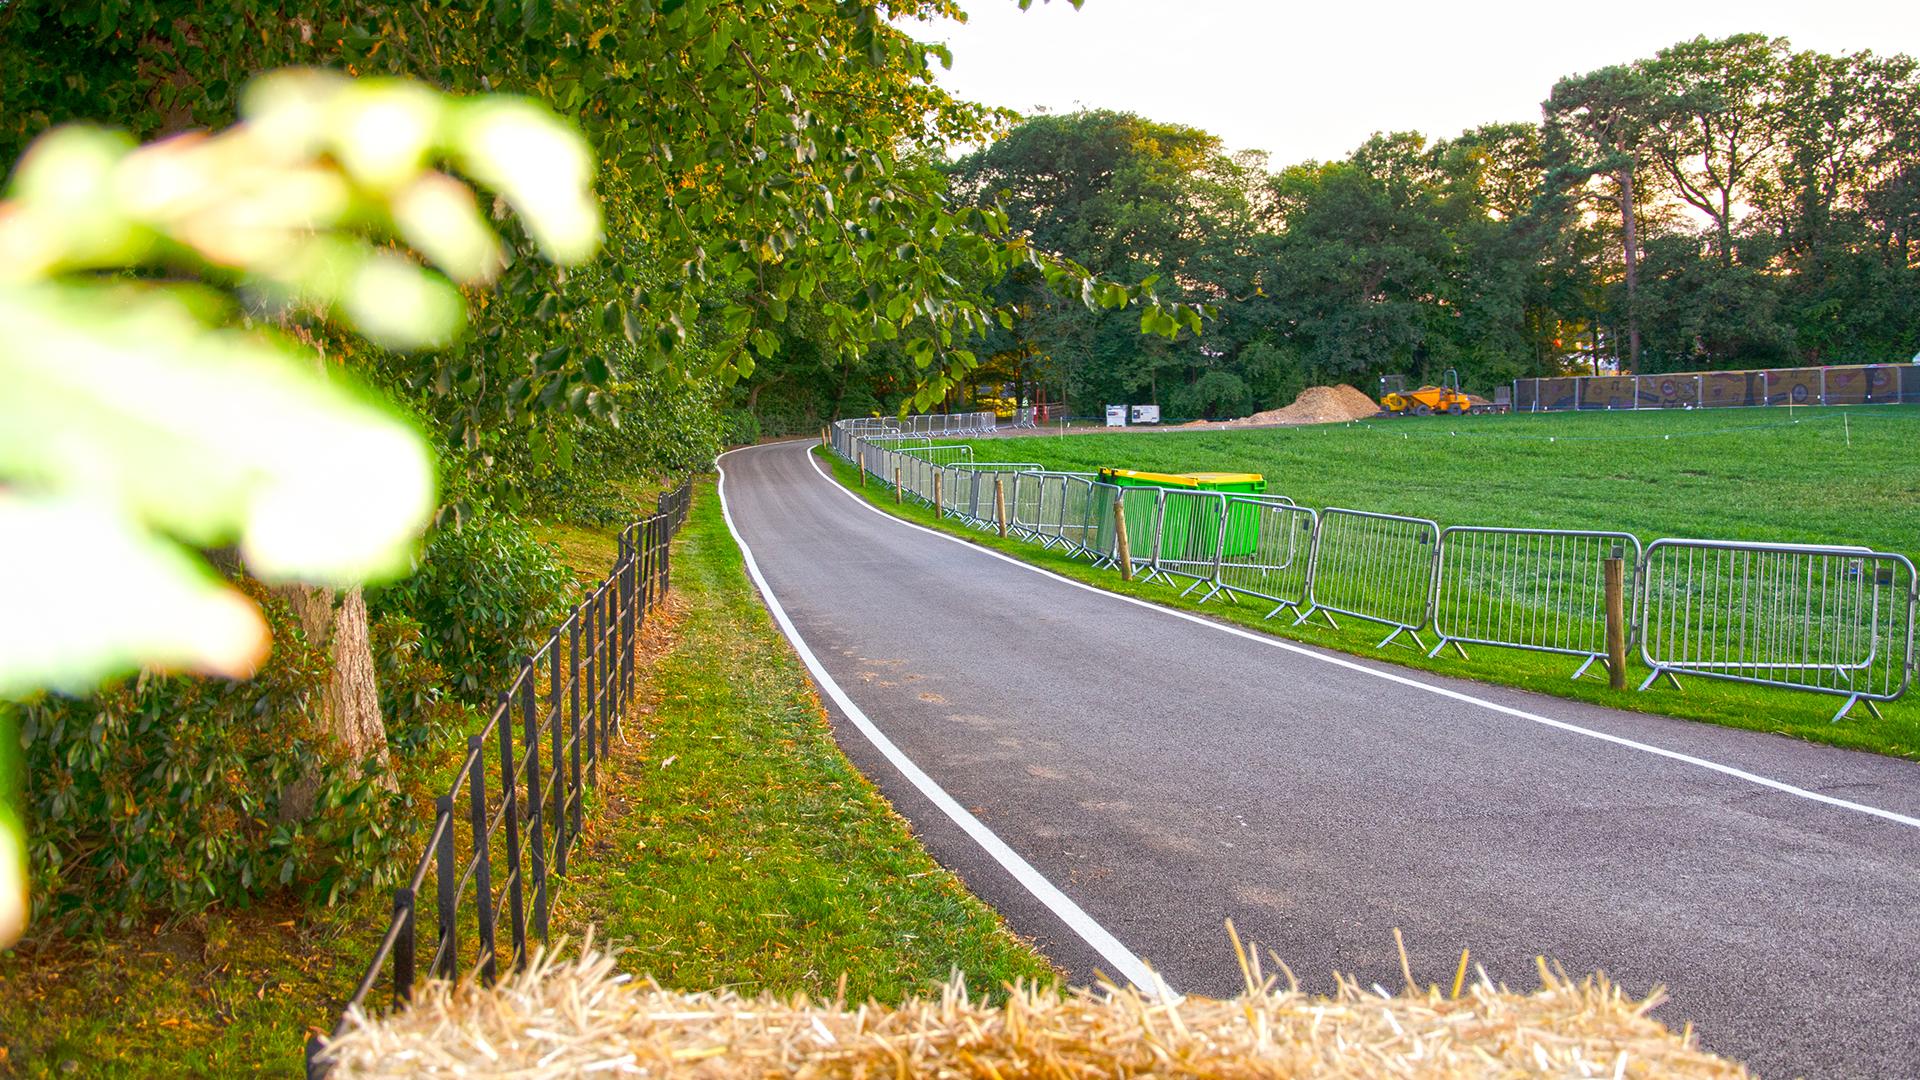 Carfest Road Marking 8